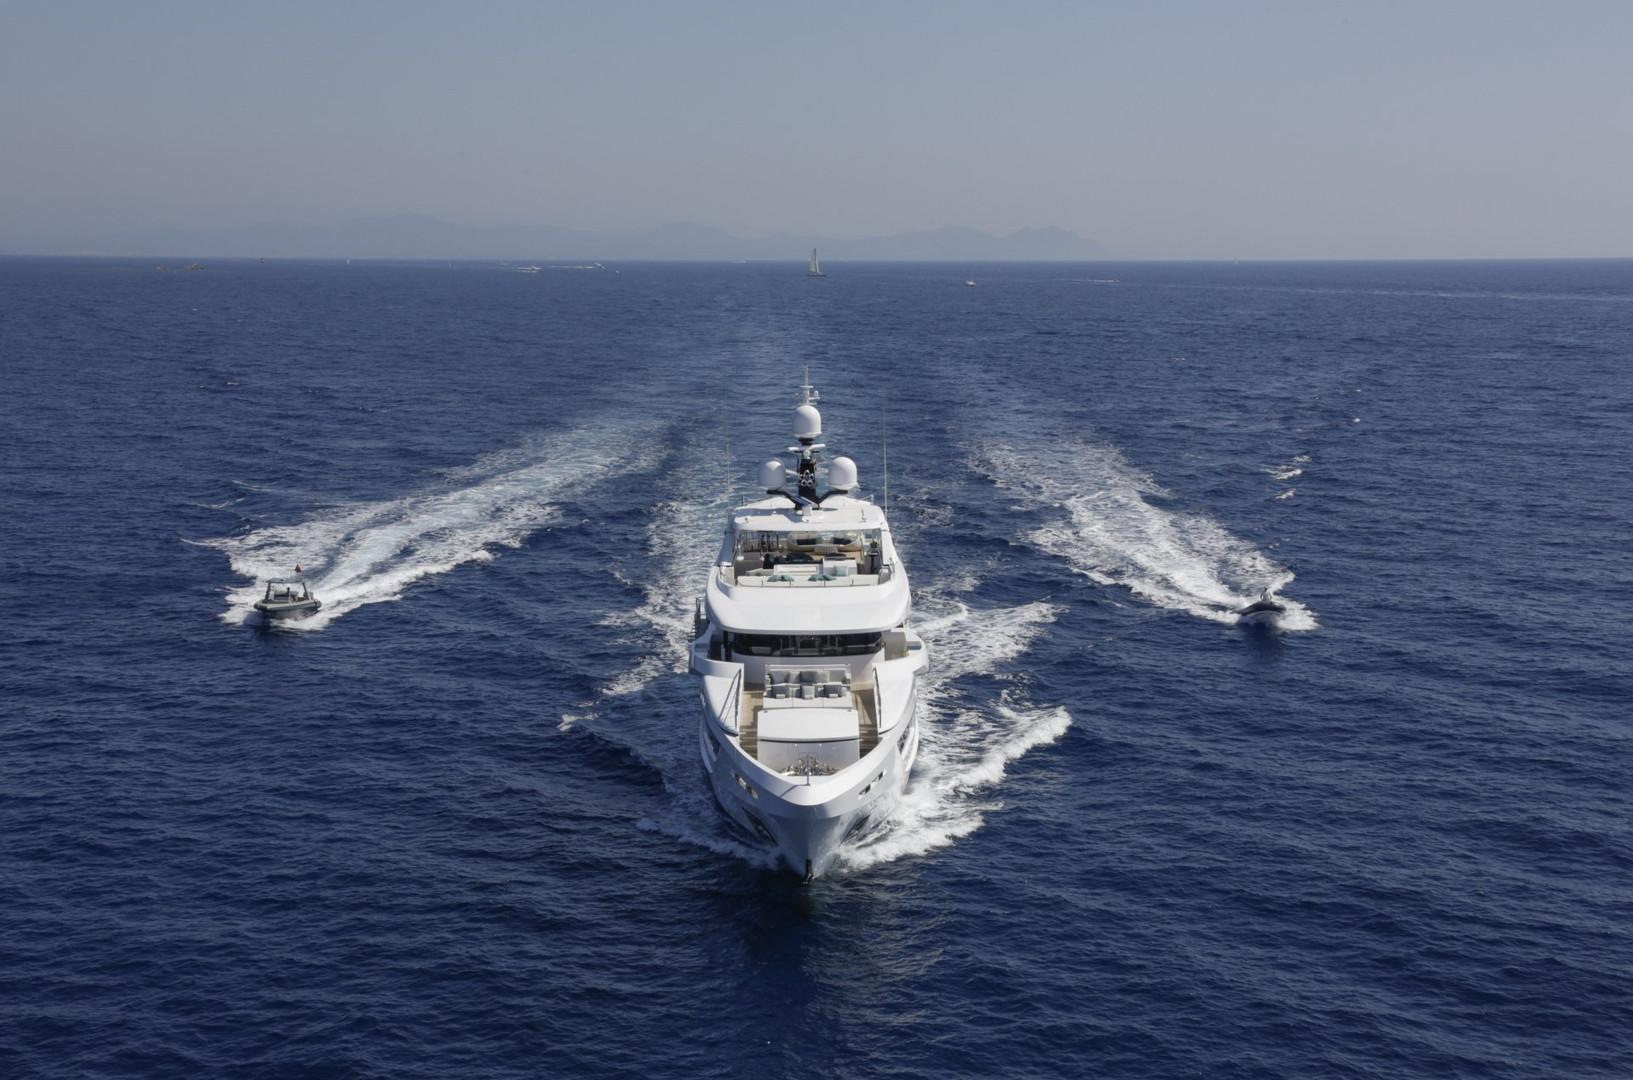 Yacht ENTOURAGE - with the full entourage flotilla!